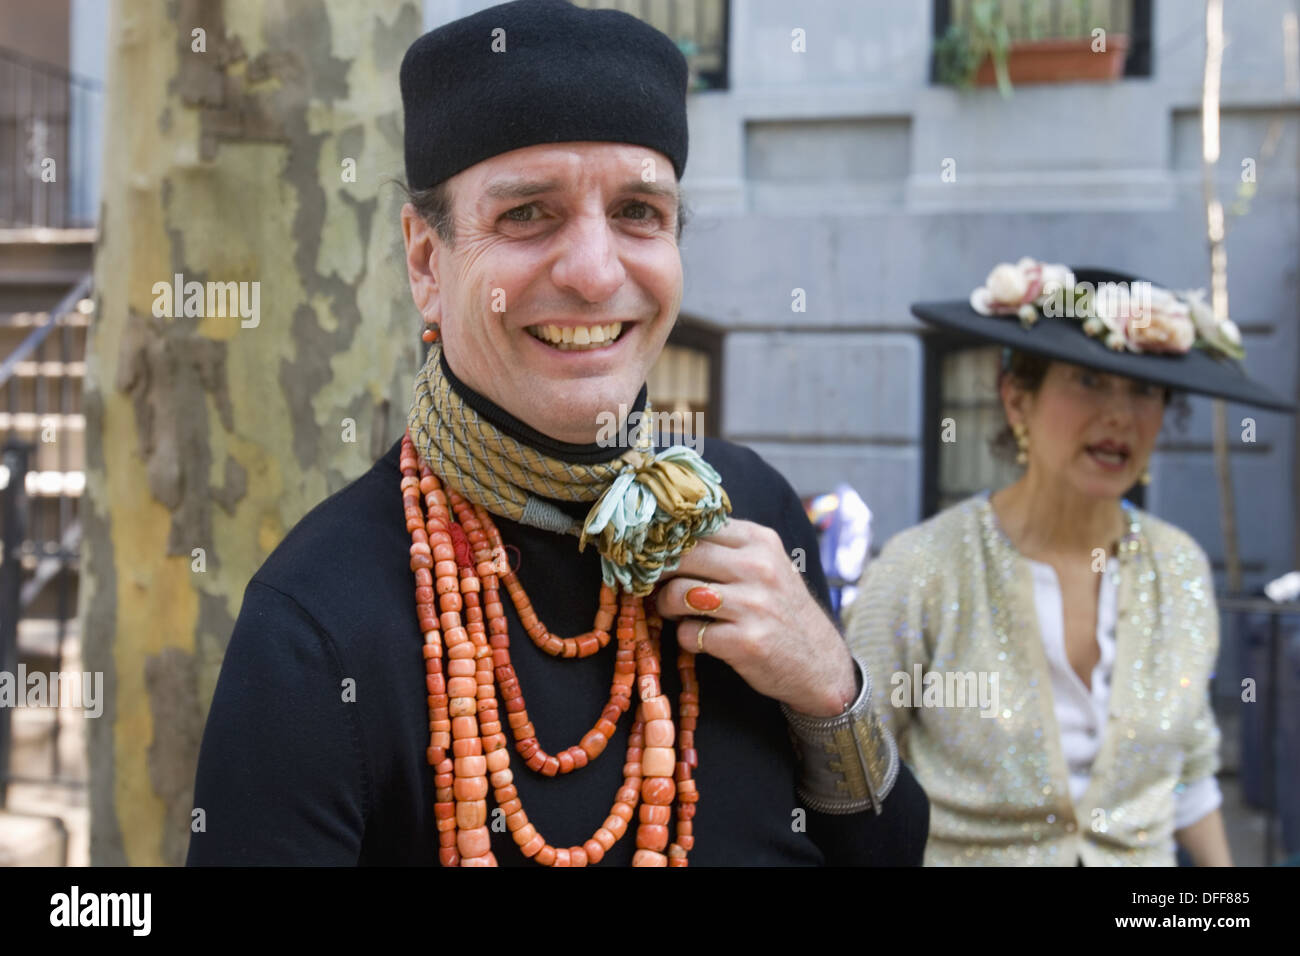 Man in Greenwich village with pillbox hat Stock Photo  61186725 - Alamy b214124b0fc